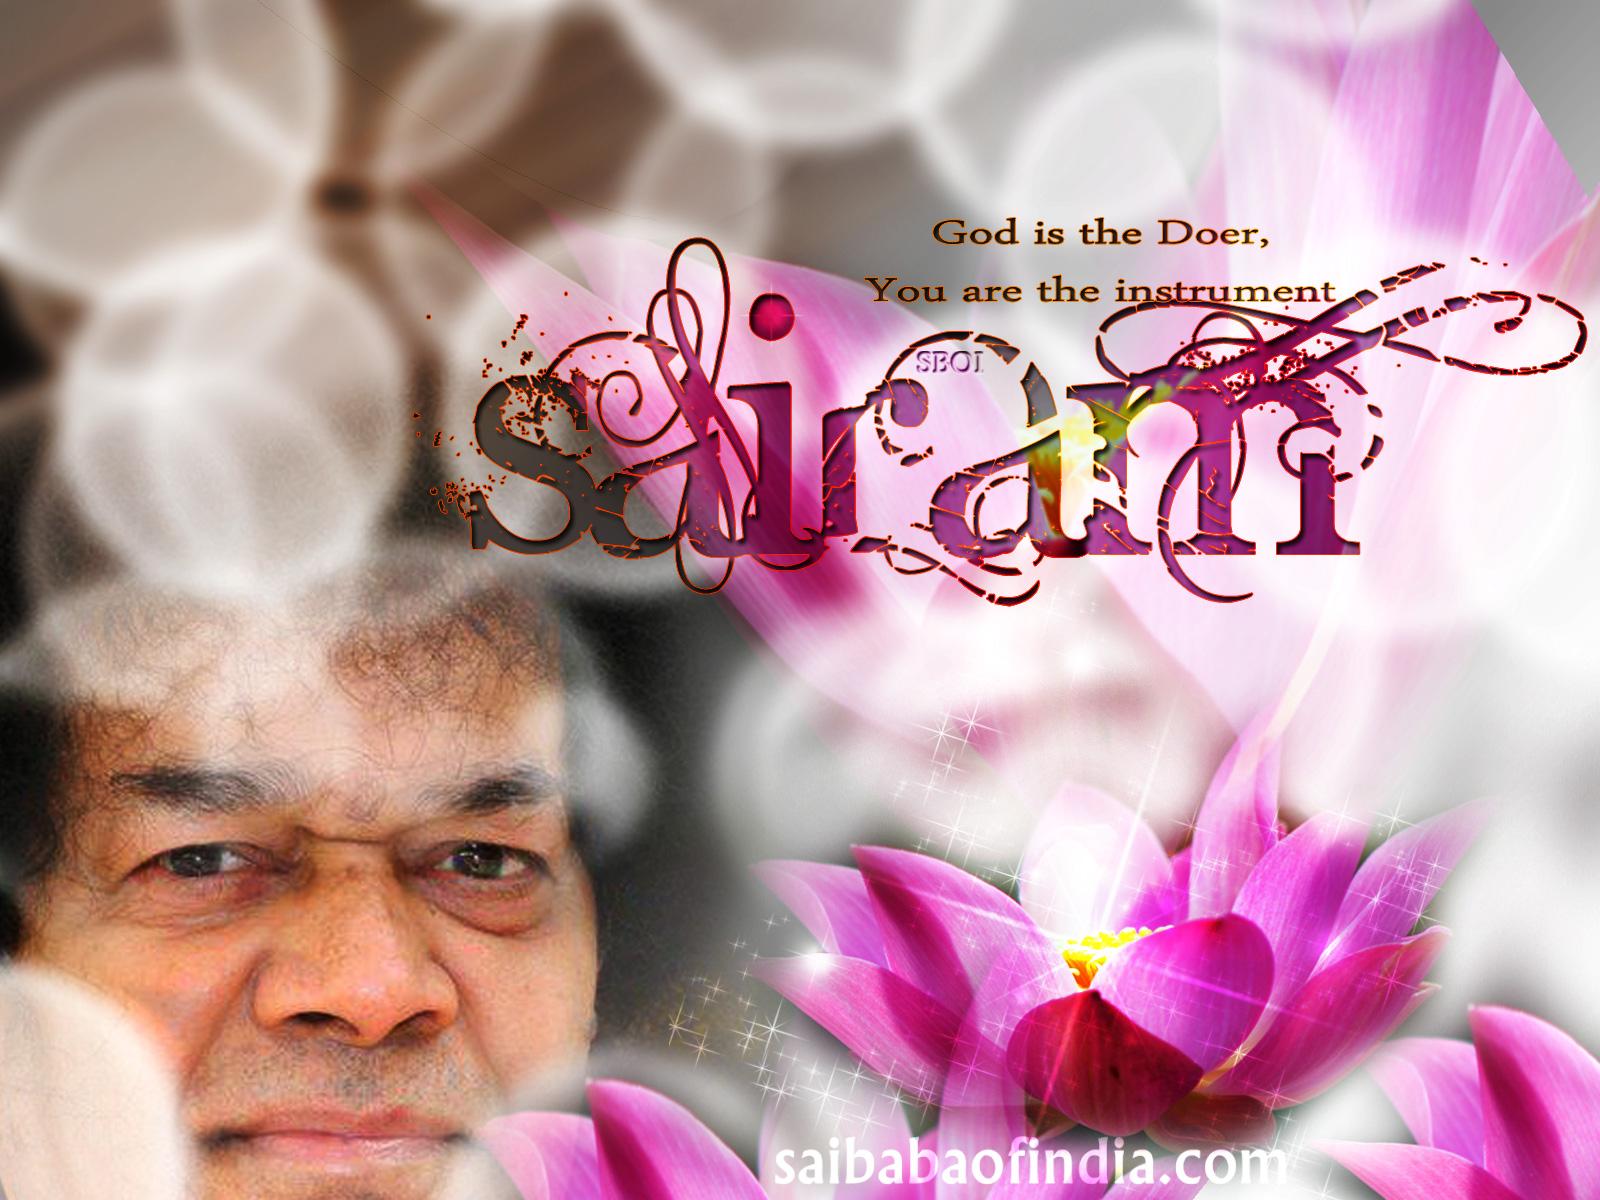 Sri Sathya Sai Baba Wallpaper Sai Baba Of Indias Weblog